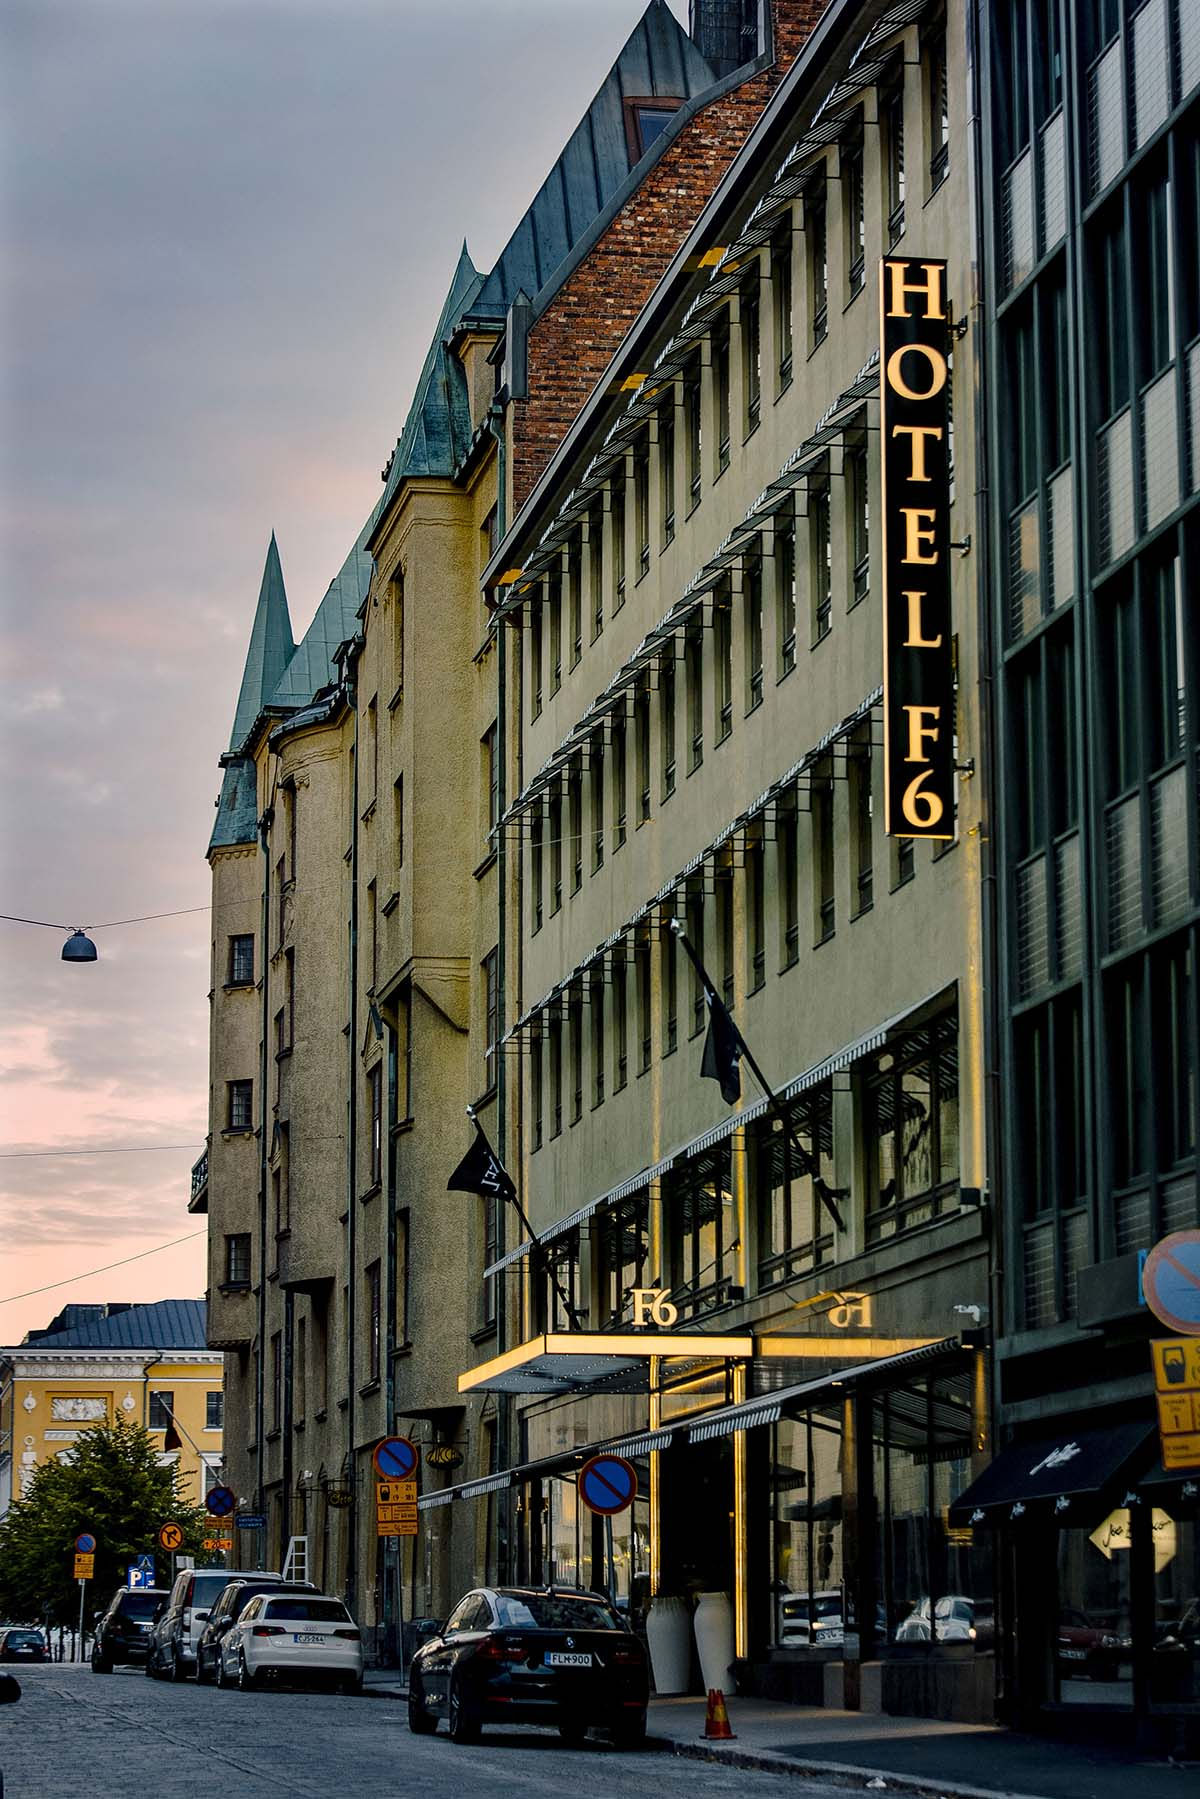 F6-NORDIC-casper-magazine-hotel-.jpg